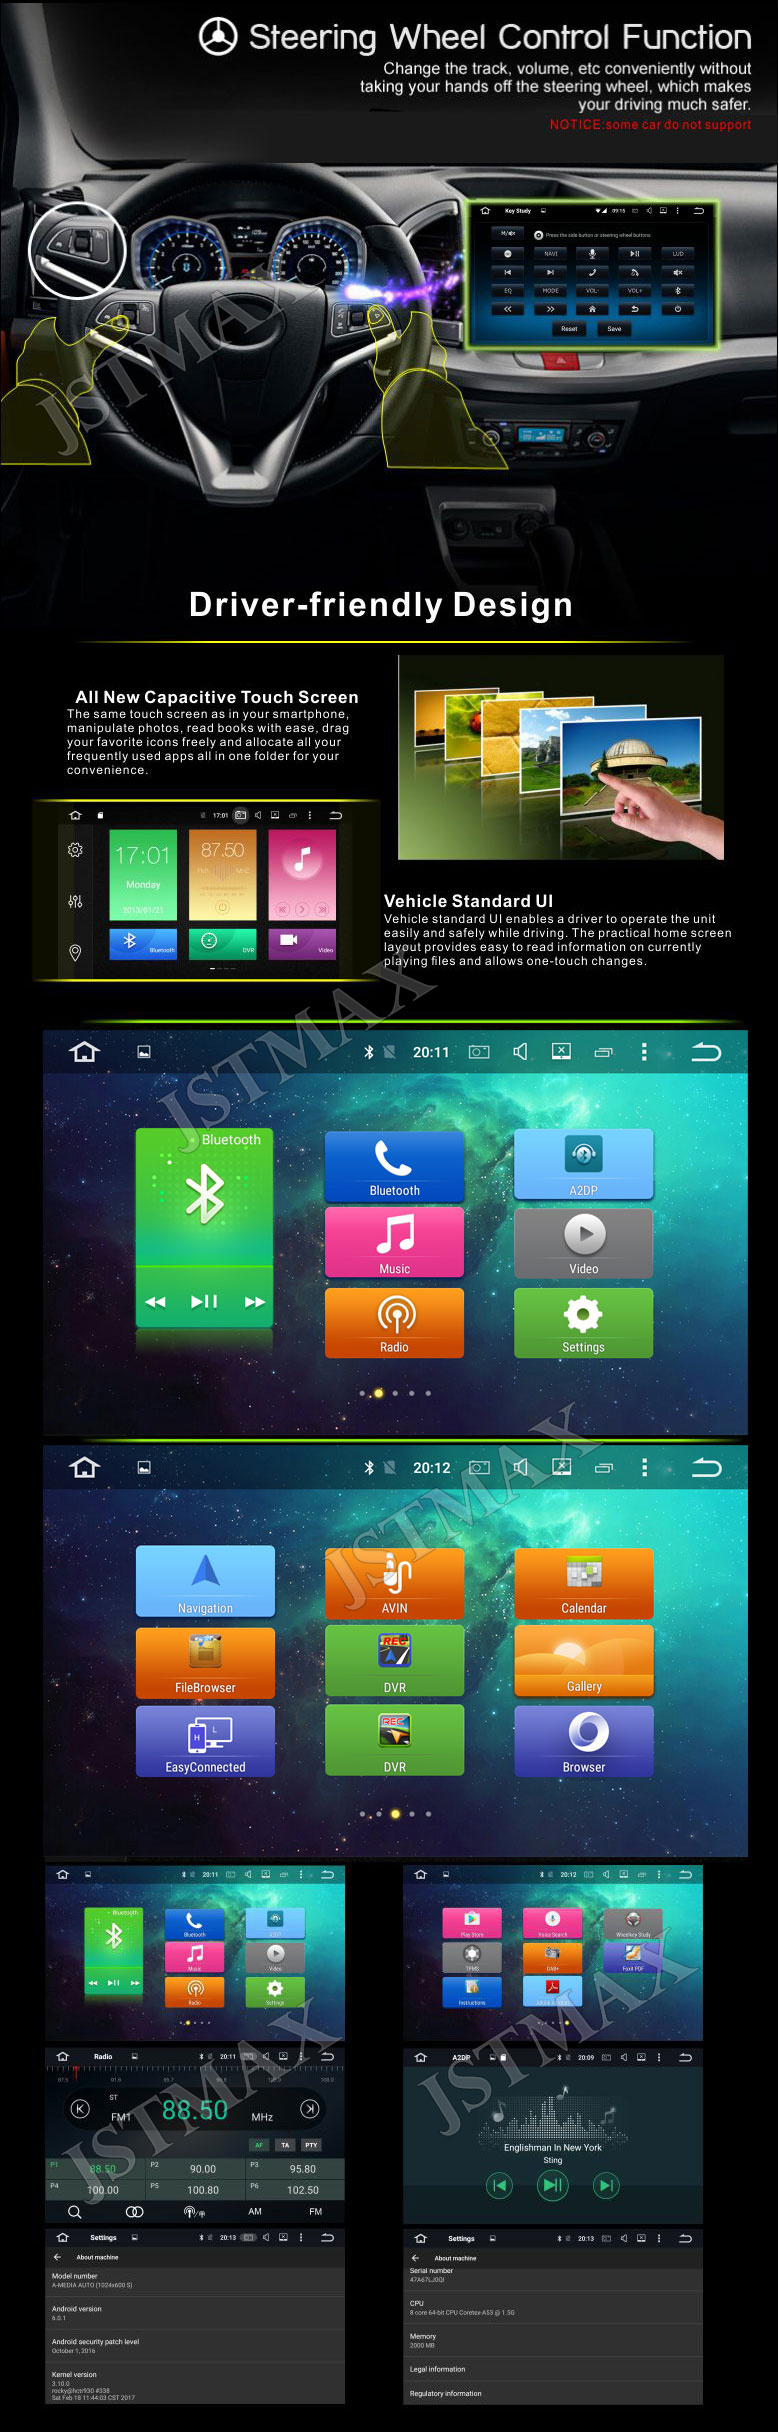 10 Android 6.0 Octa Core 2G RAM Car Raido GPS Player For Toyota Land  Cruiser LC200 2008-2013 NO DVD Head unit FM BT Player - us206 64c4af34b974